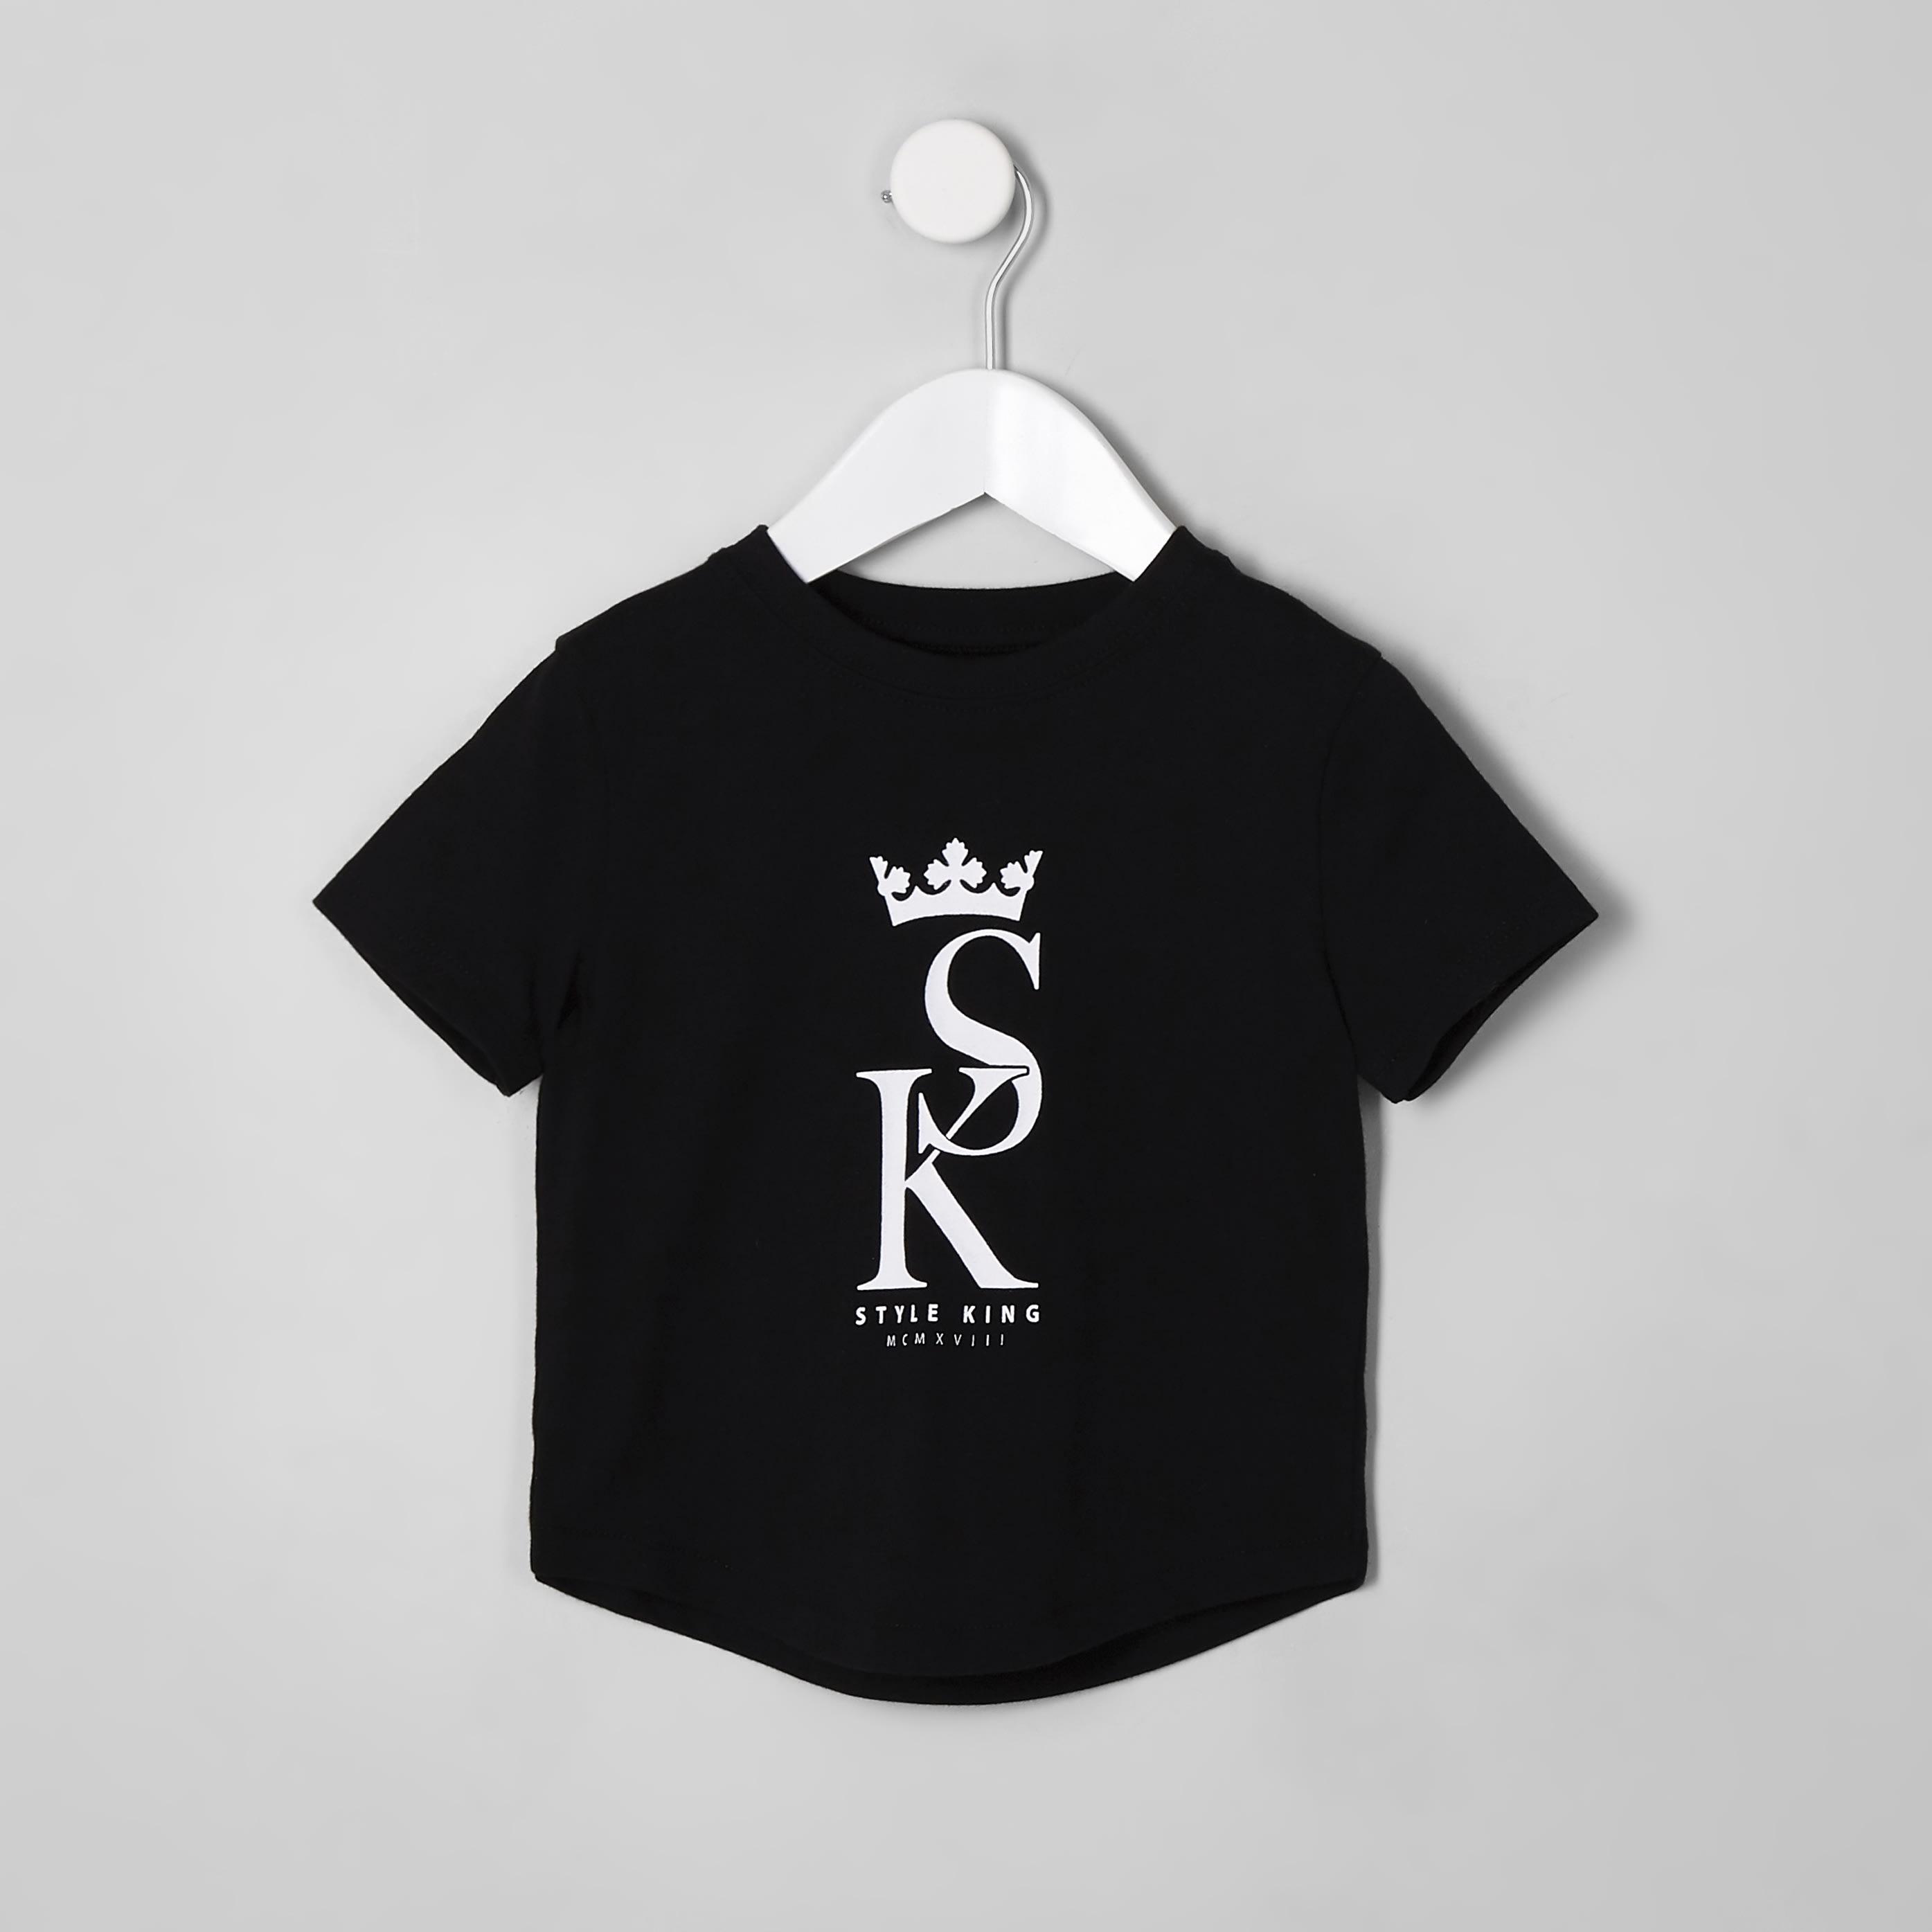 River Island Mens Baby Boys Black 'style king' T-shirt (6-9 Mths)